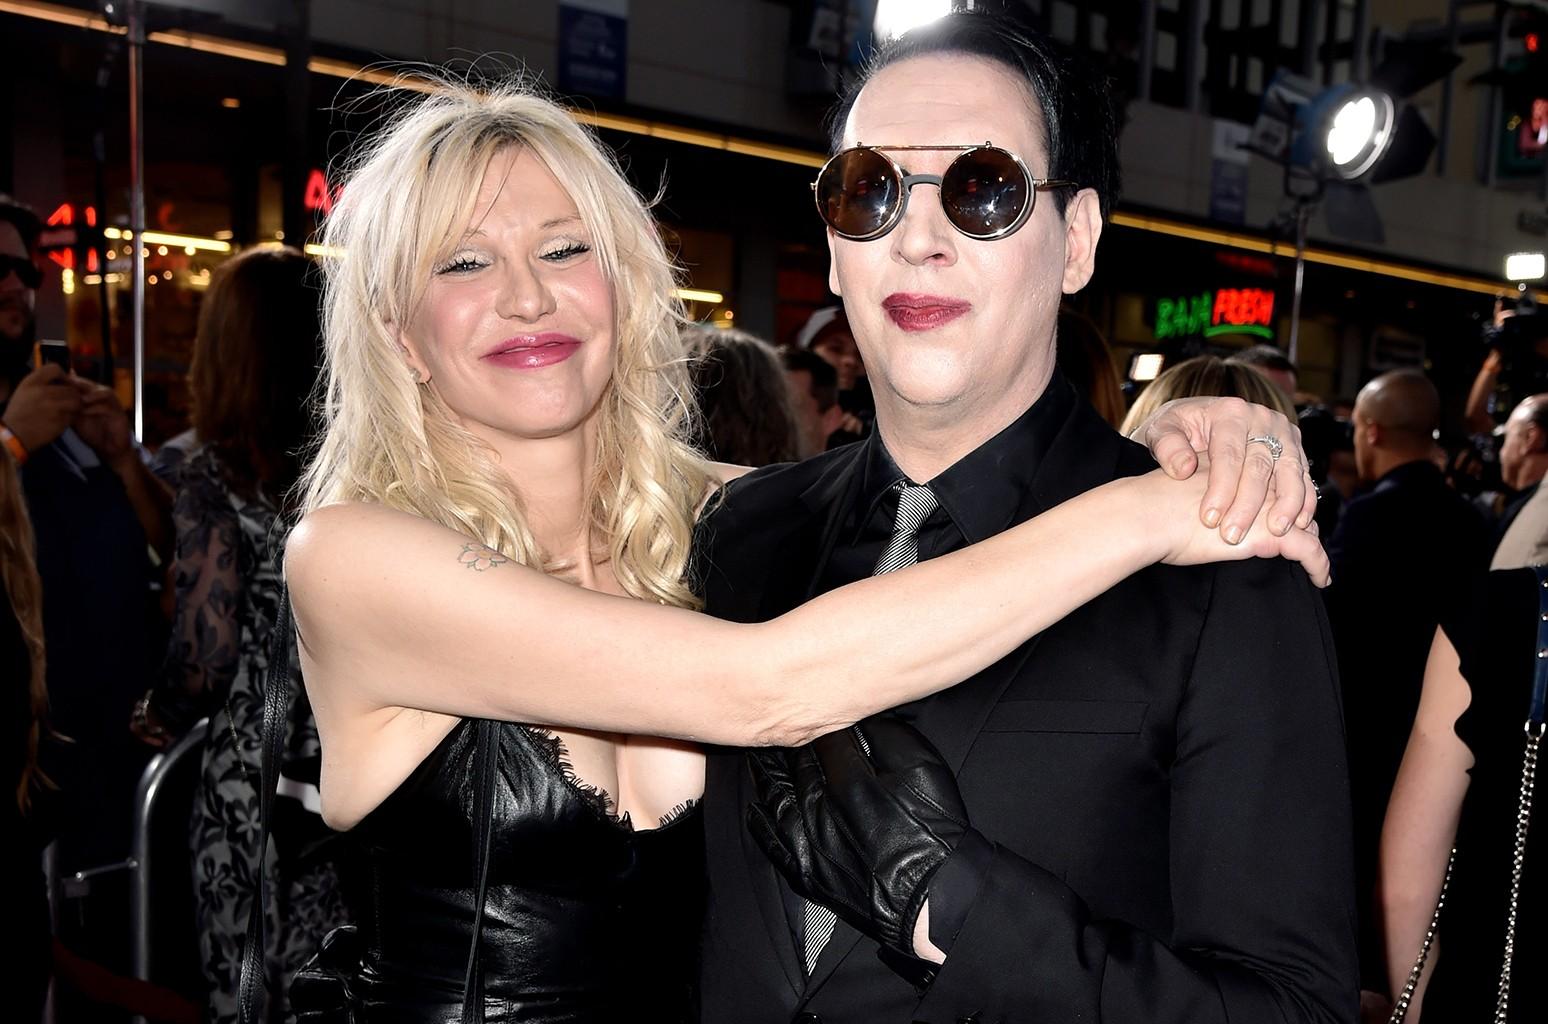 Courtney Love Marilyn Manson